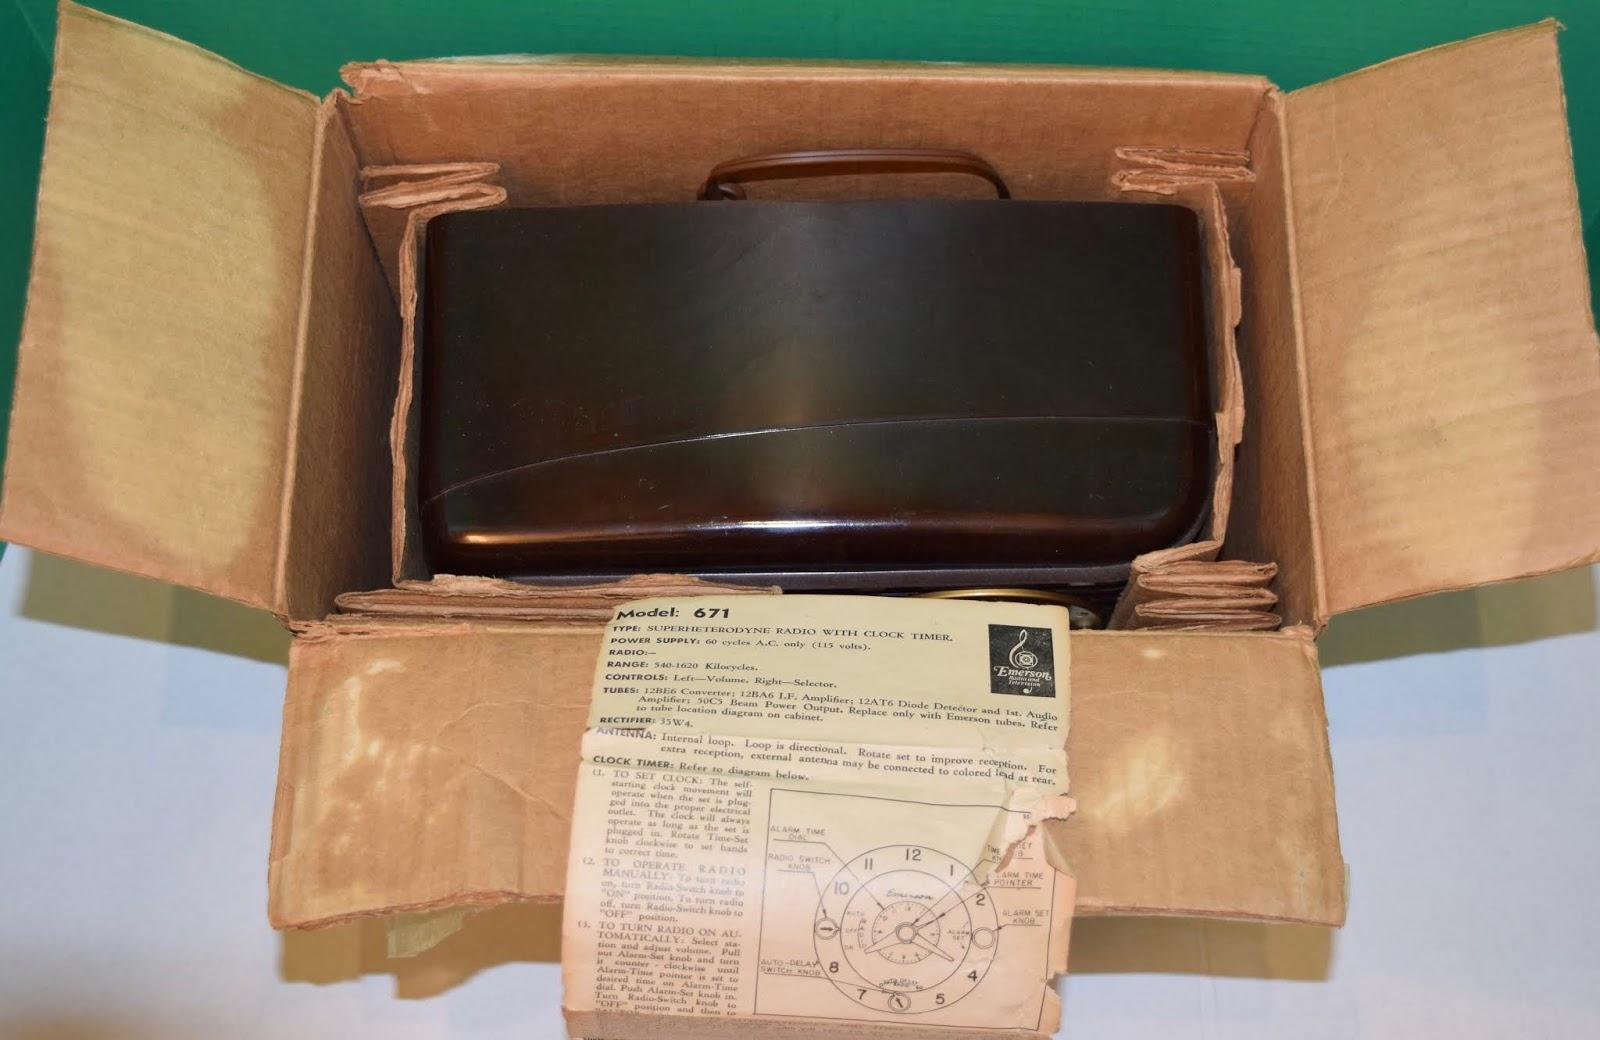 Americanradiodesign Deco Mid Century Retro Styled Vintage Tan America Timer Wiring Diagram Emerson 671 1950 Clock Radio